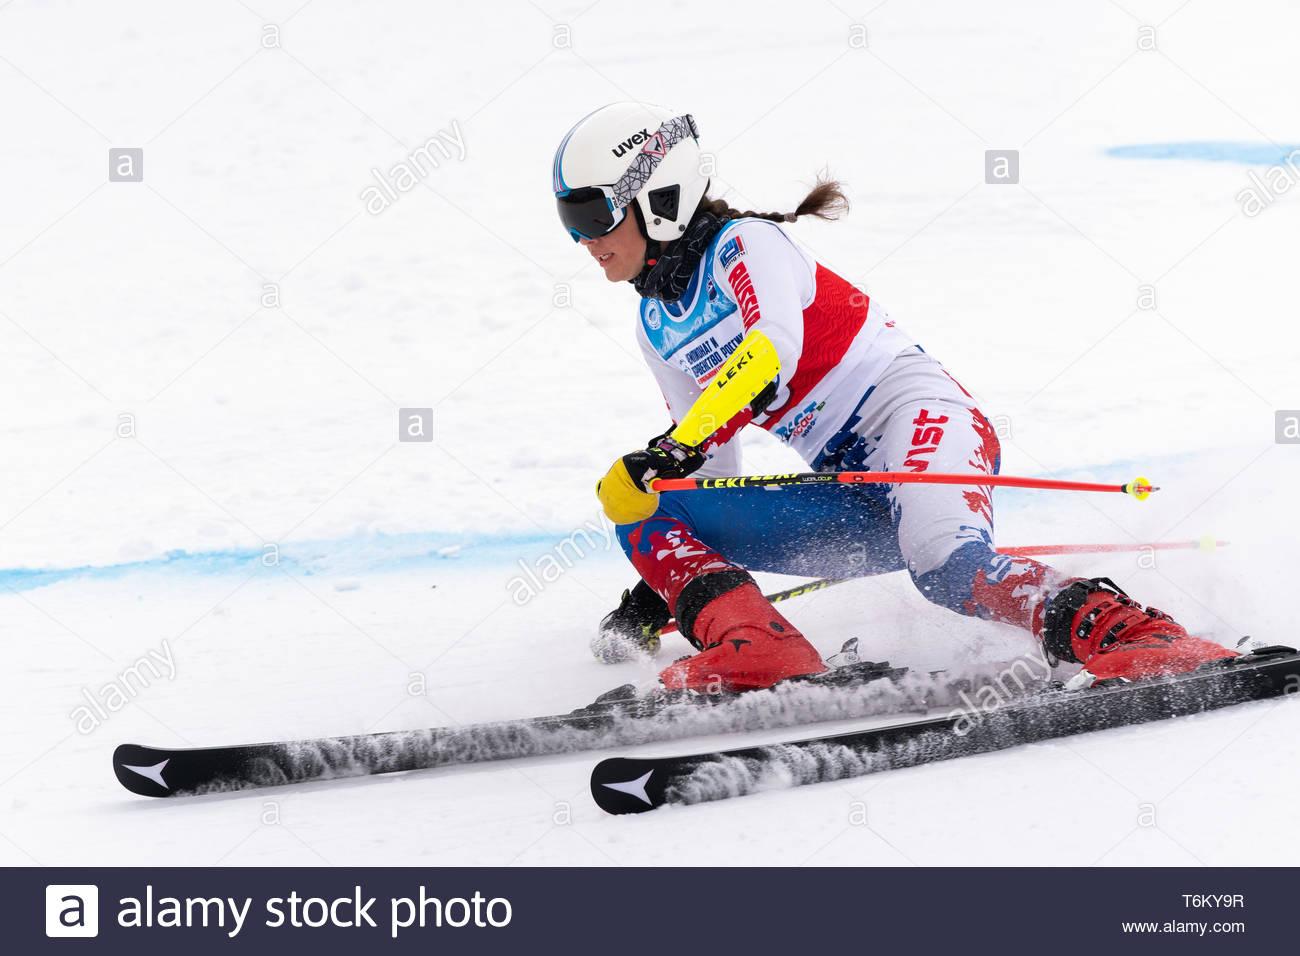 KAMCHATKA, RUSSIA - APRIL 2, 2019: Mountain skier Sofya Arkhipova (Sverdlovsk Region) skiing down mount slope. International Ski Federation Championsh - Stock Image